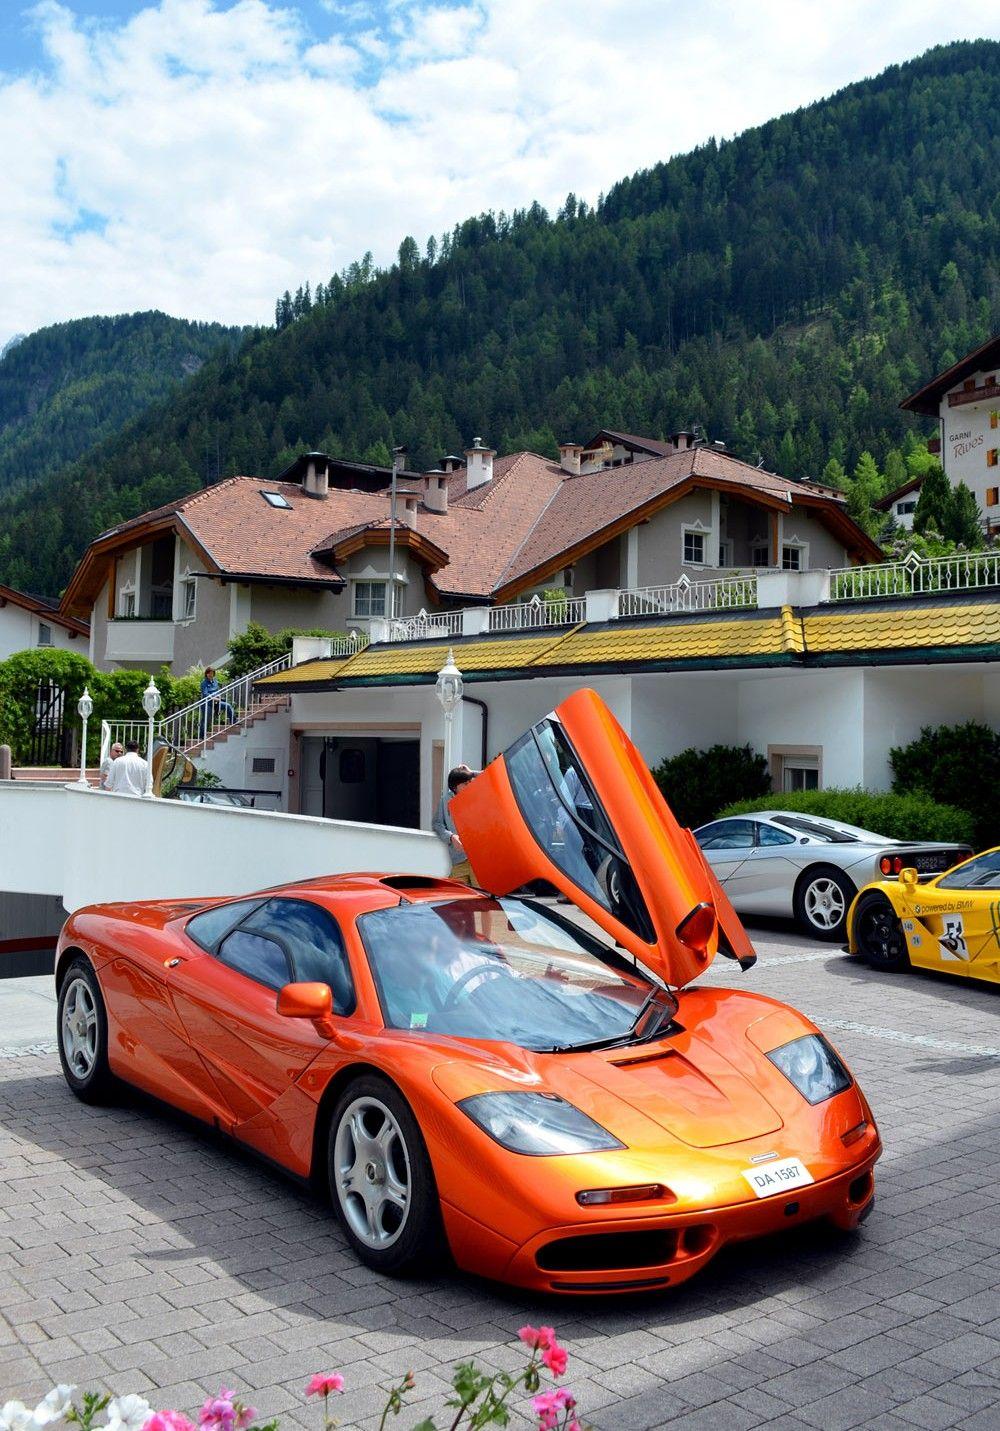 Best 20 mclaren f1 ideas on pinterest mclaren cars mclaren shop and maclaren cars